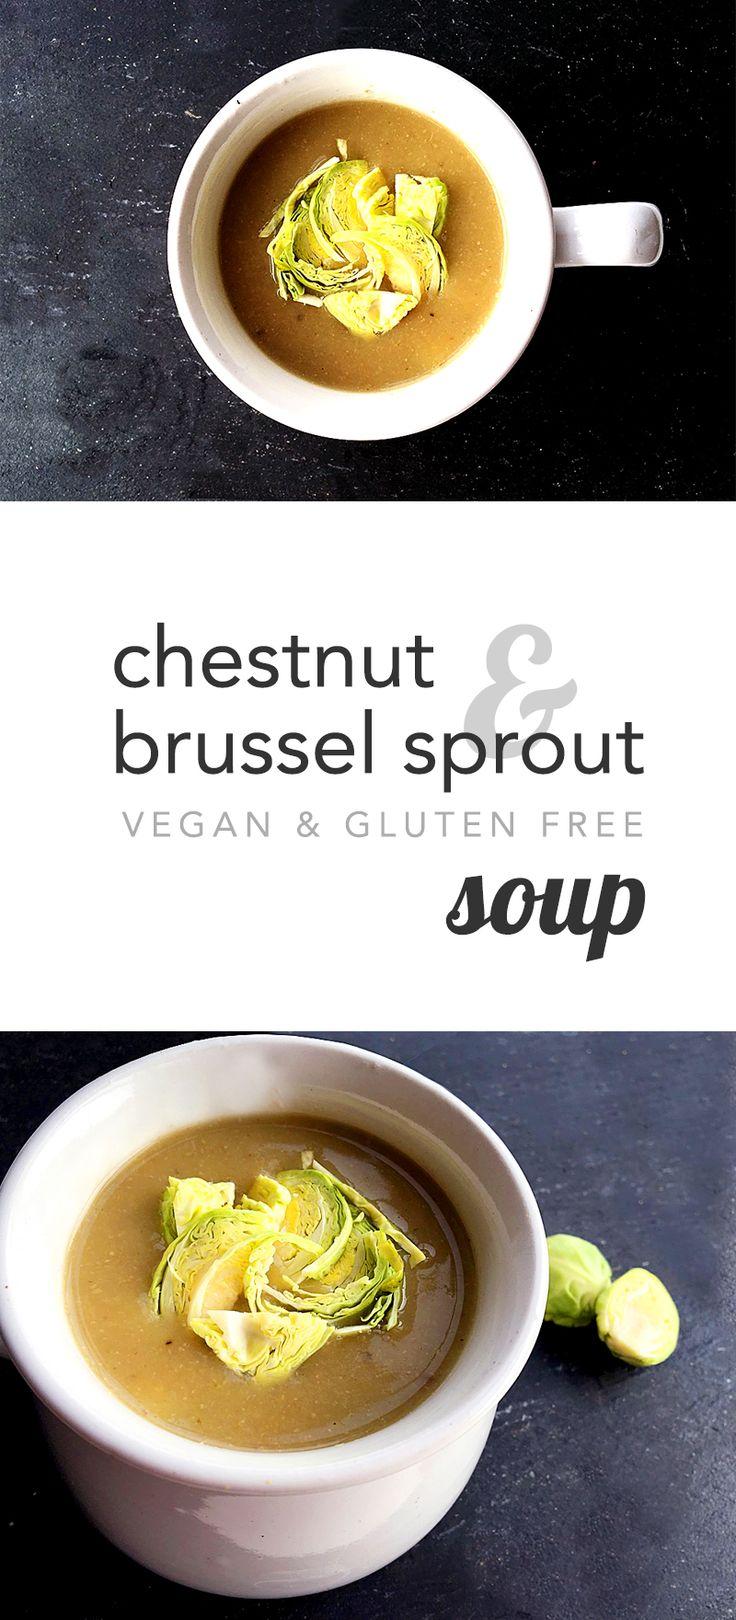 Chestnut & brussel sprout soup, vegan, gluten free (scheduled via http://www.tailwindapp.com?utm_source=pinterest&utm_medium=twpin&utm_content=post111958921&utm_campaign=scheduler_attribution)